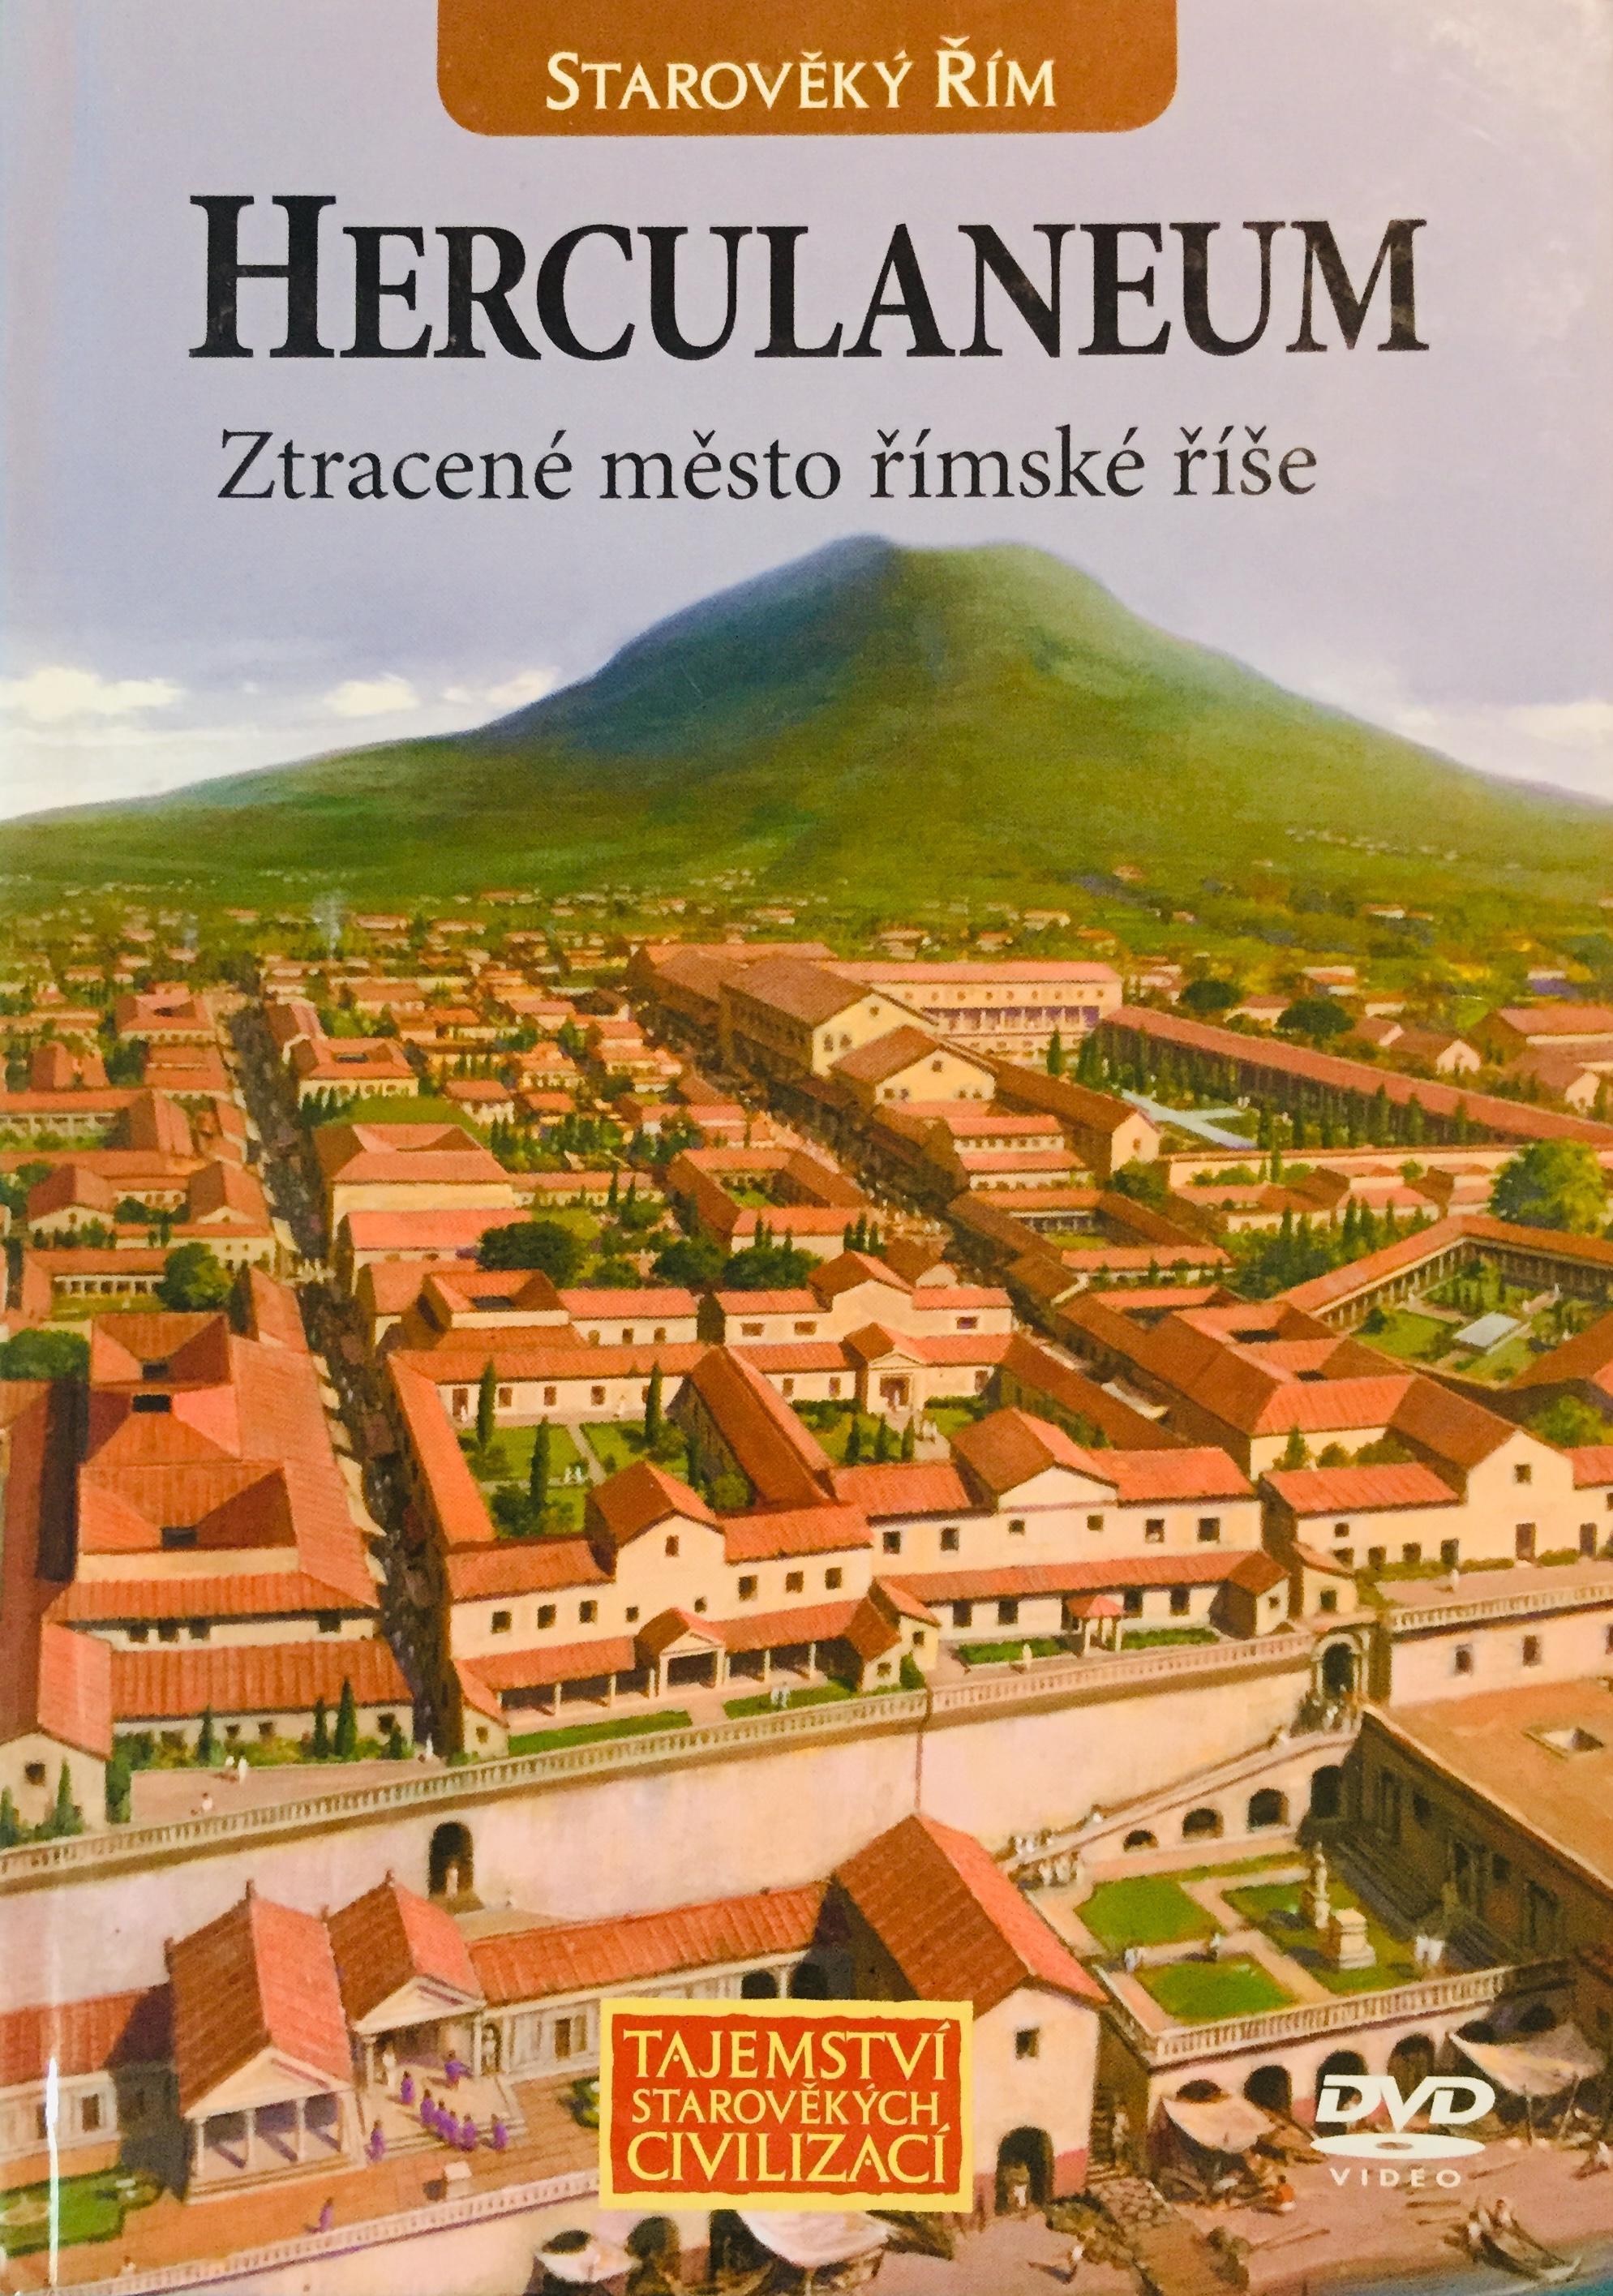 Starověká mysteria - Herculaneum - DVD /brožura/